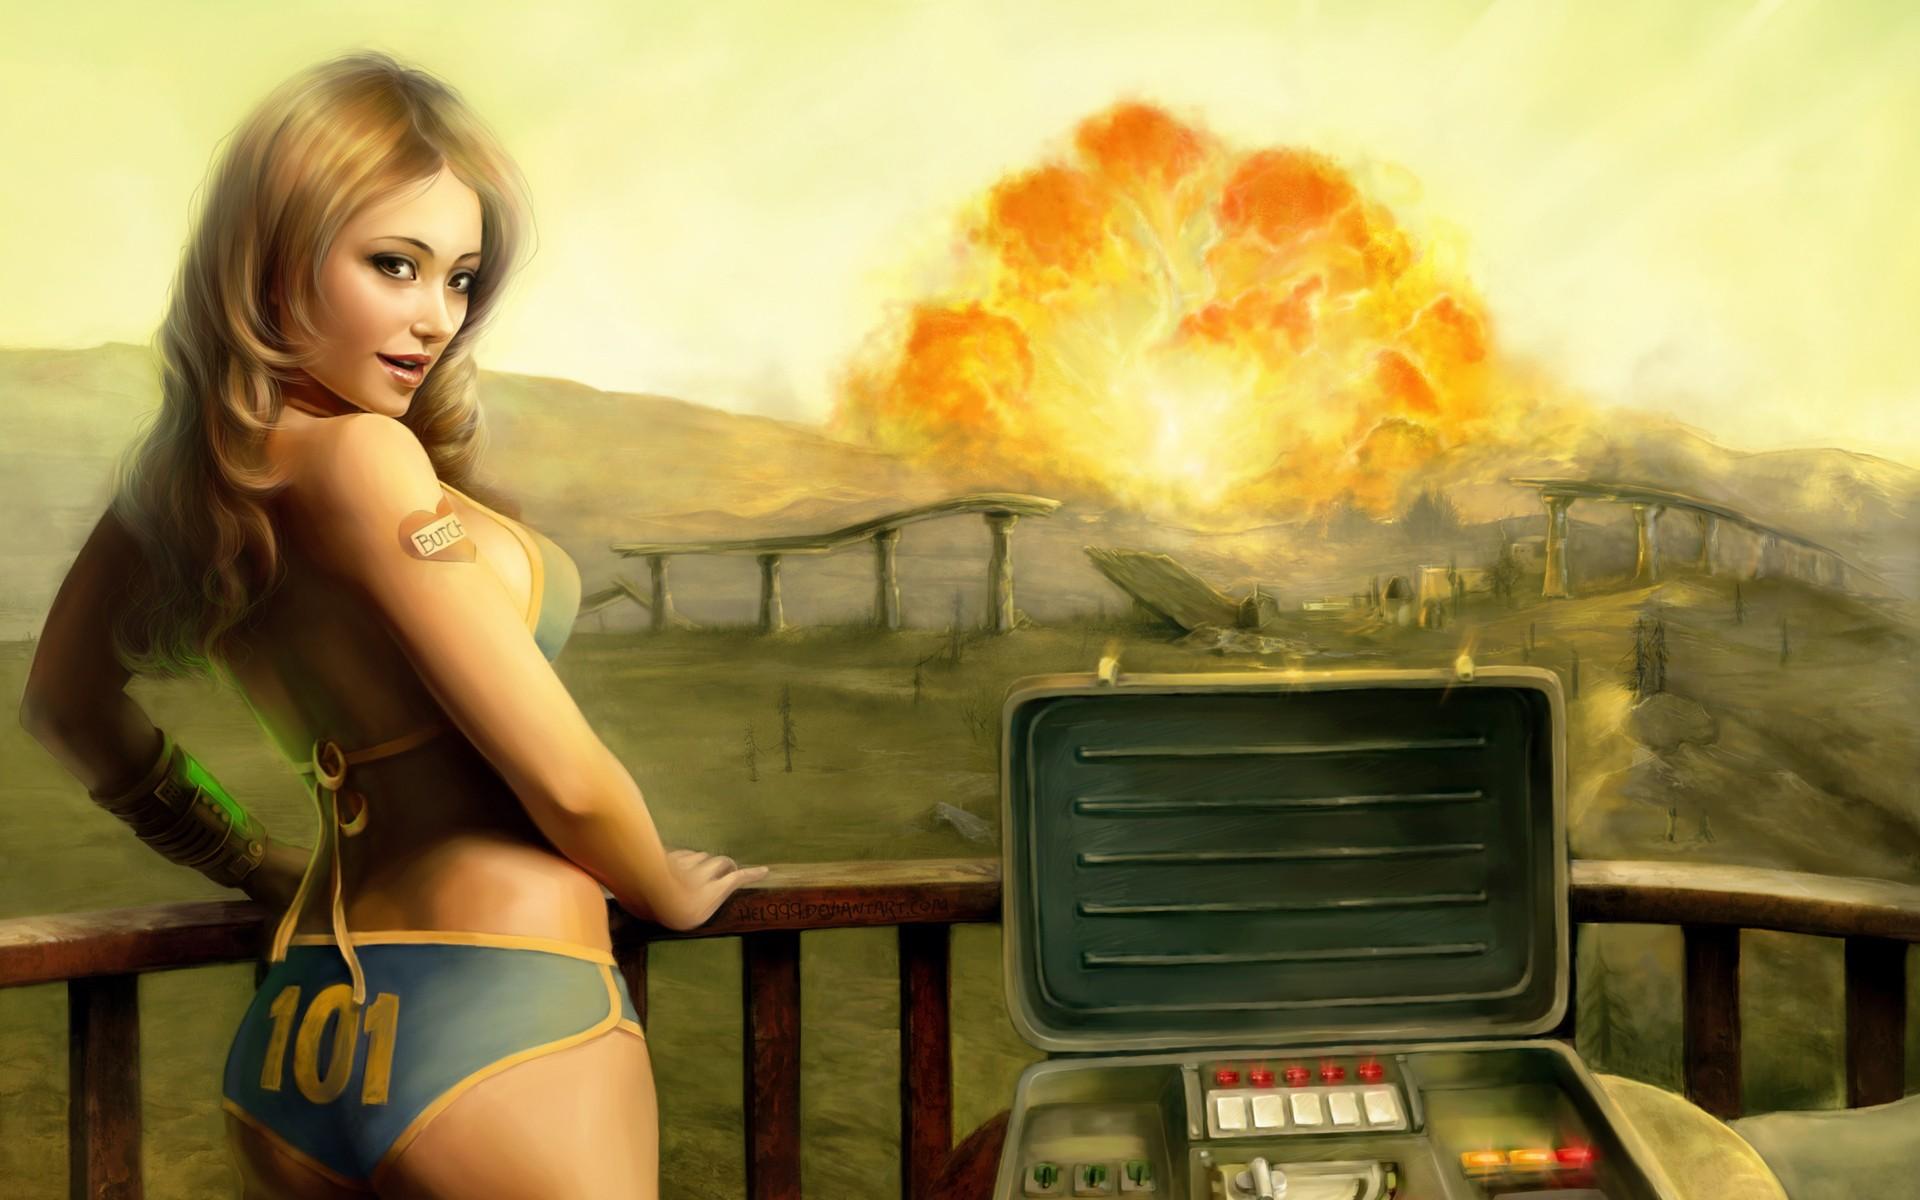 Fallout 3 babe nude fucking image